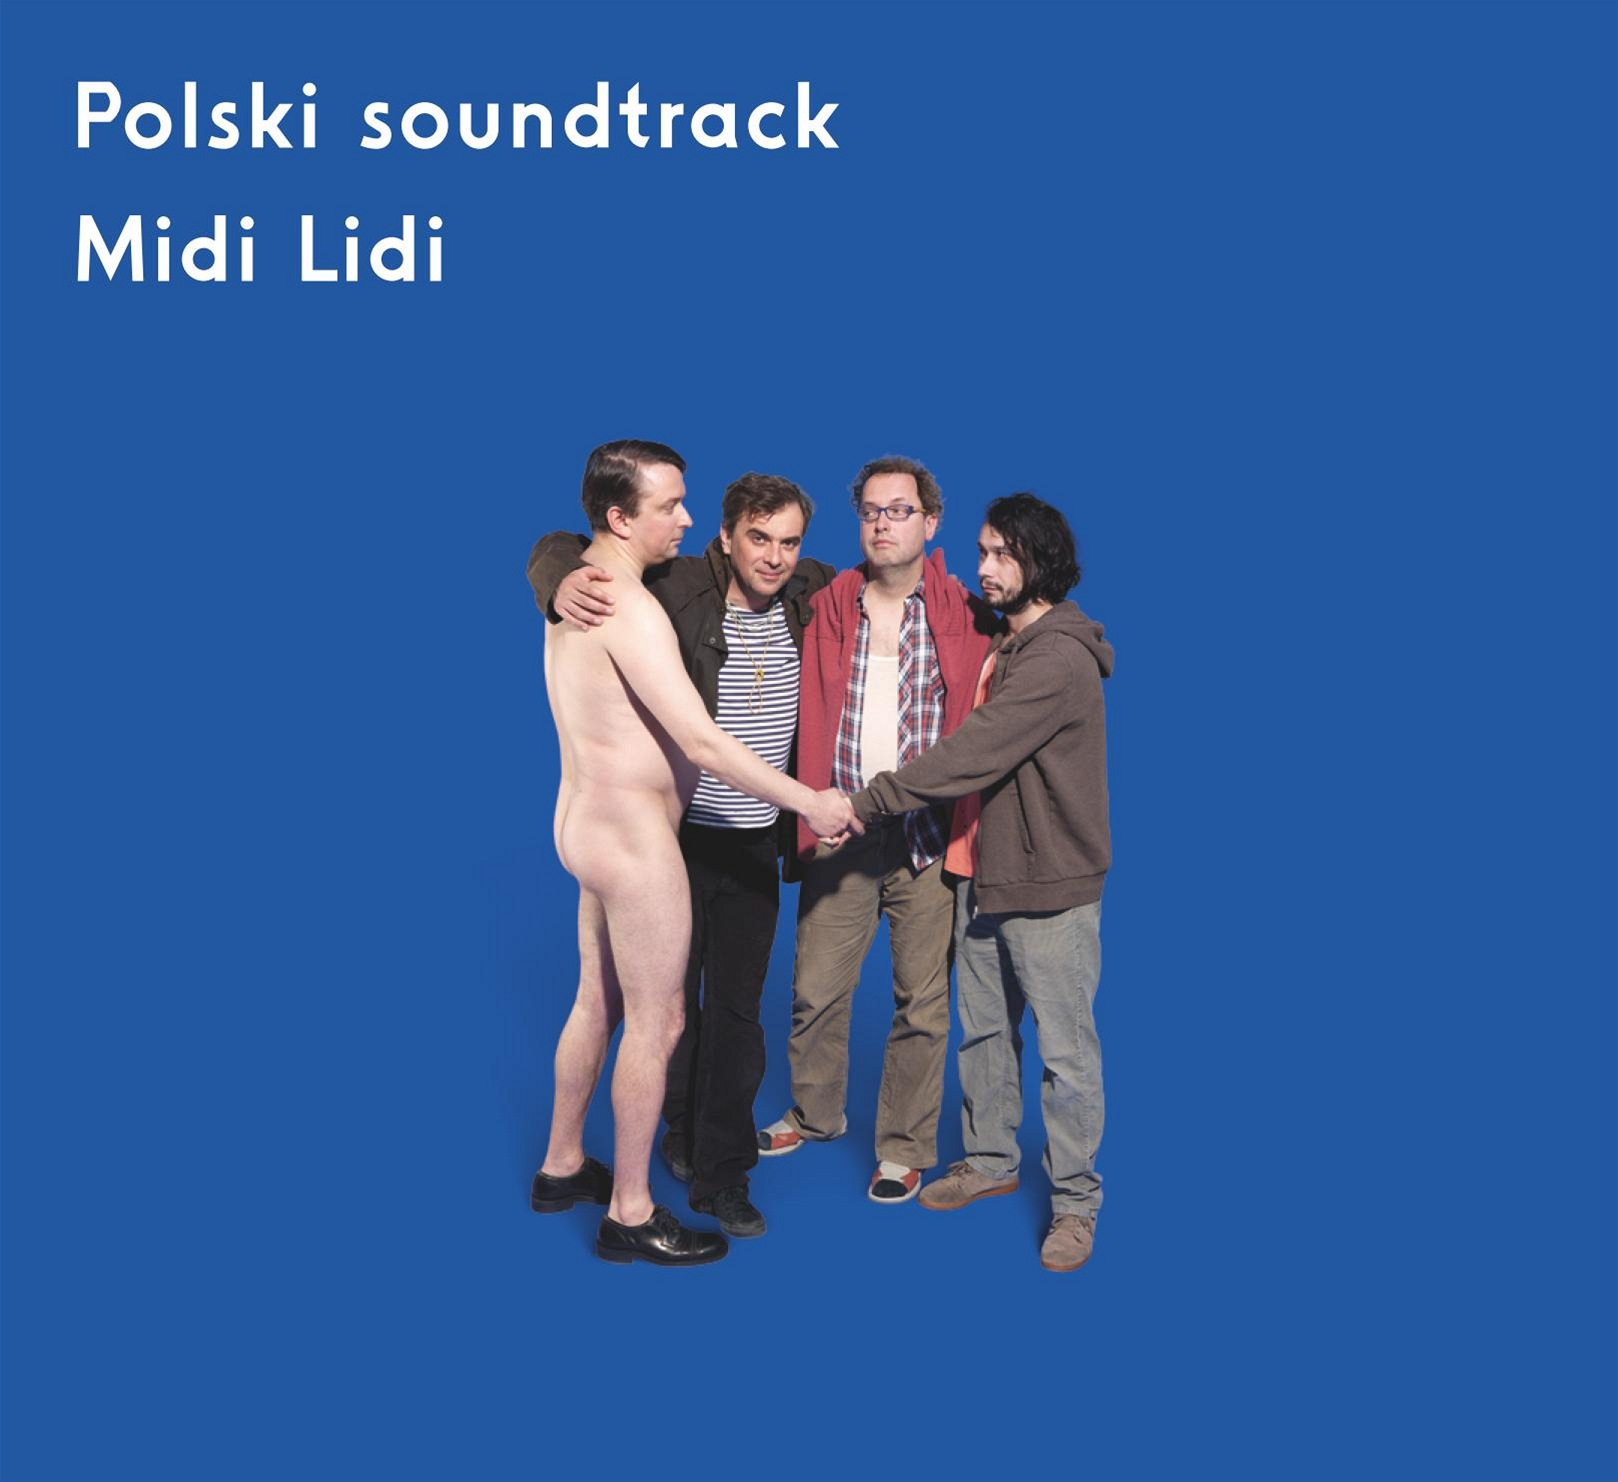 Polski soundtrack Midi Lidi